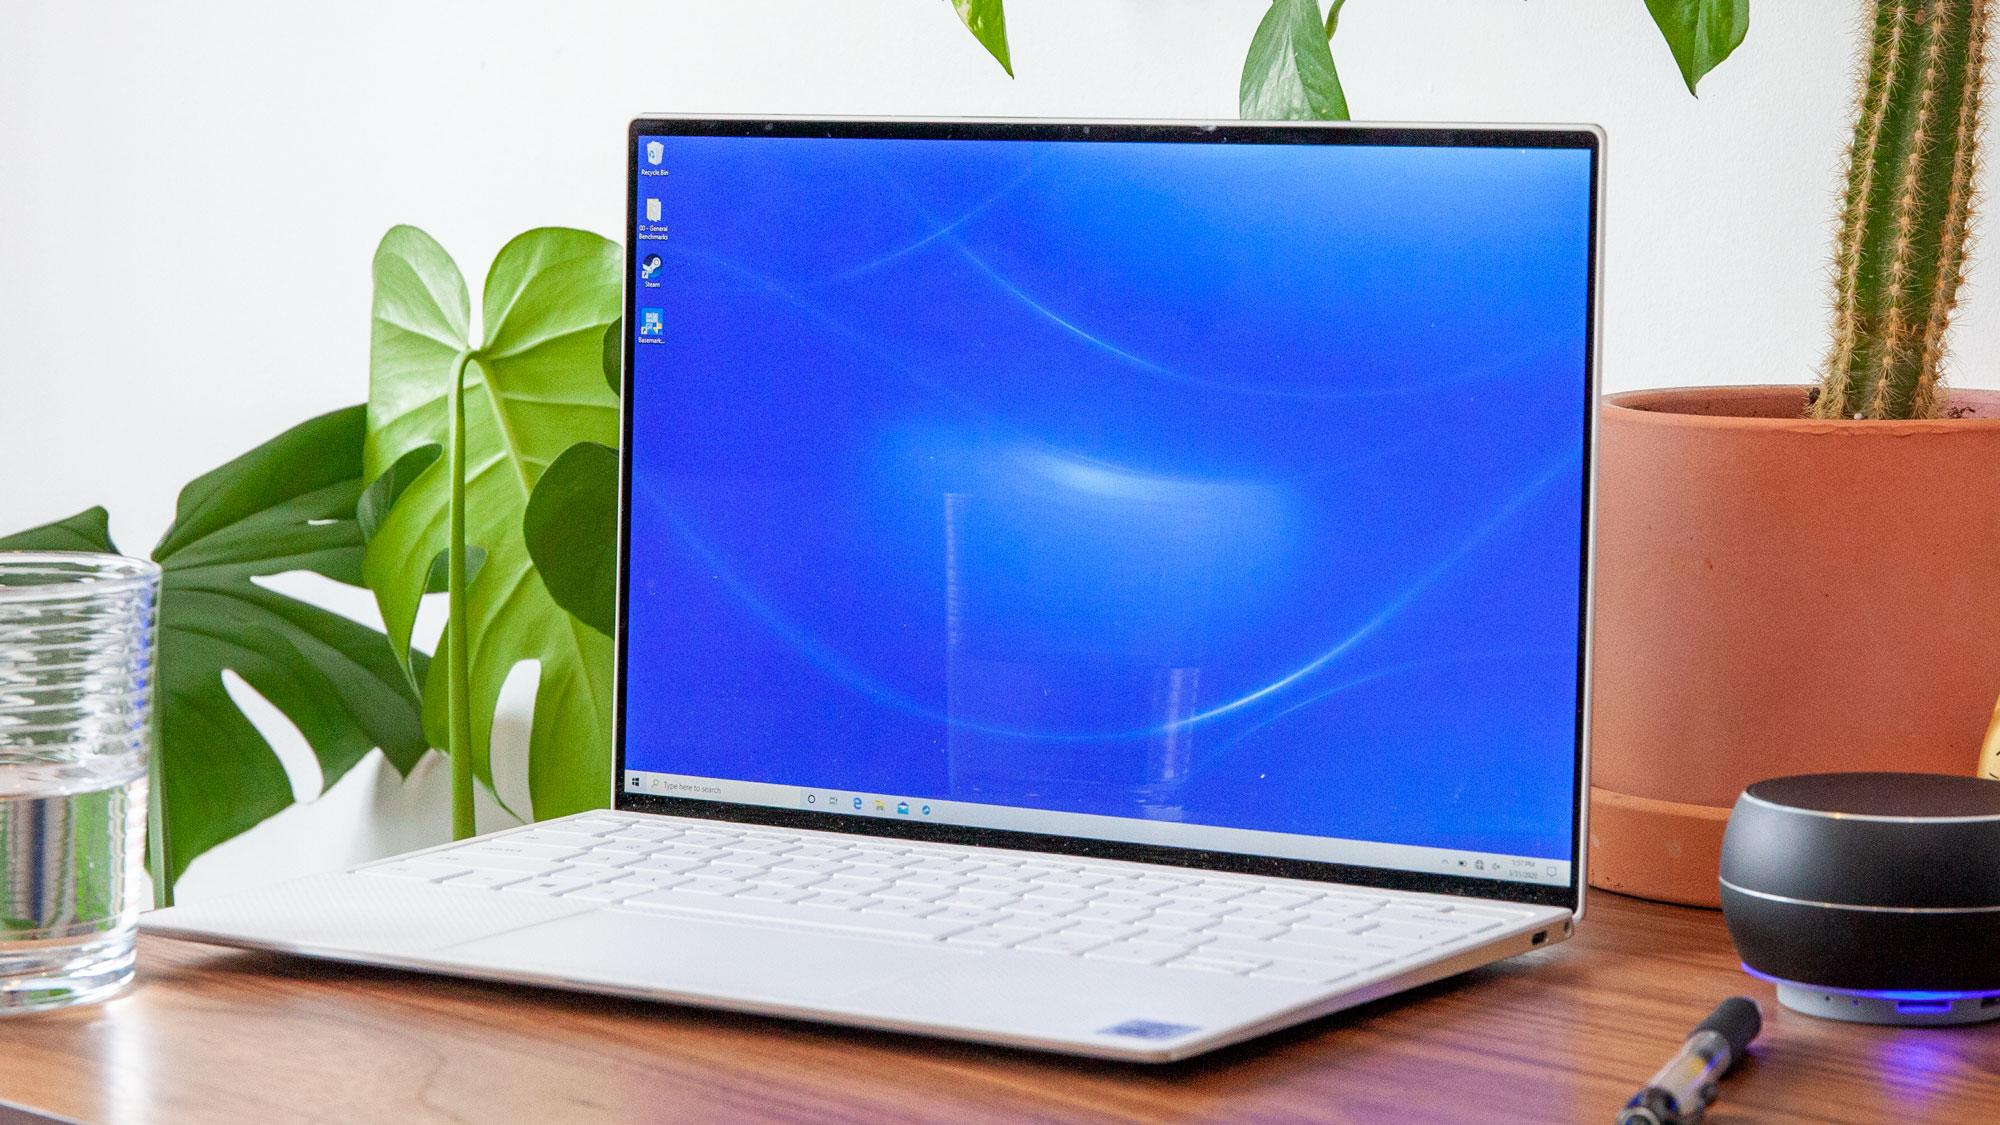 Dell XPS 13 vs MacBook Pro - verdict